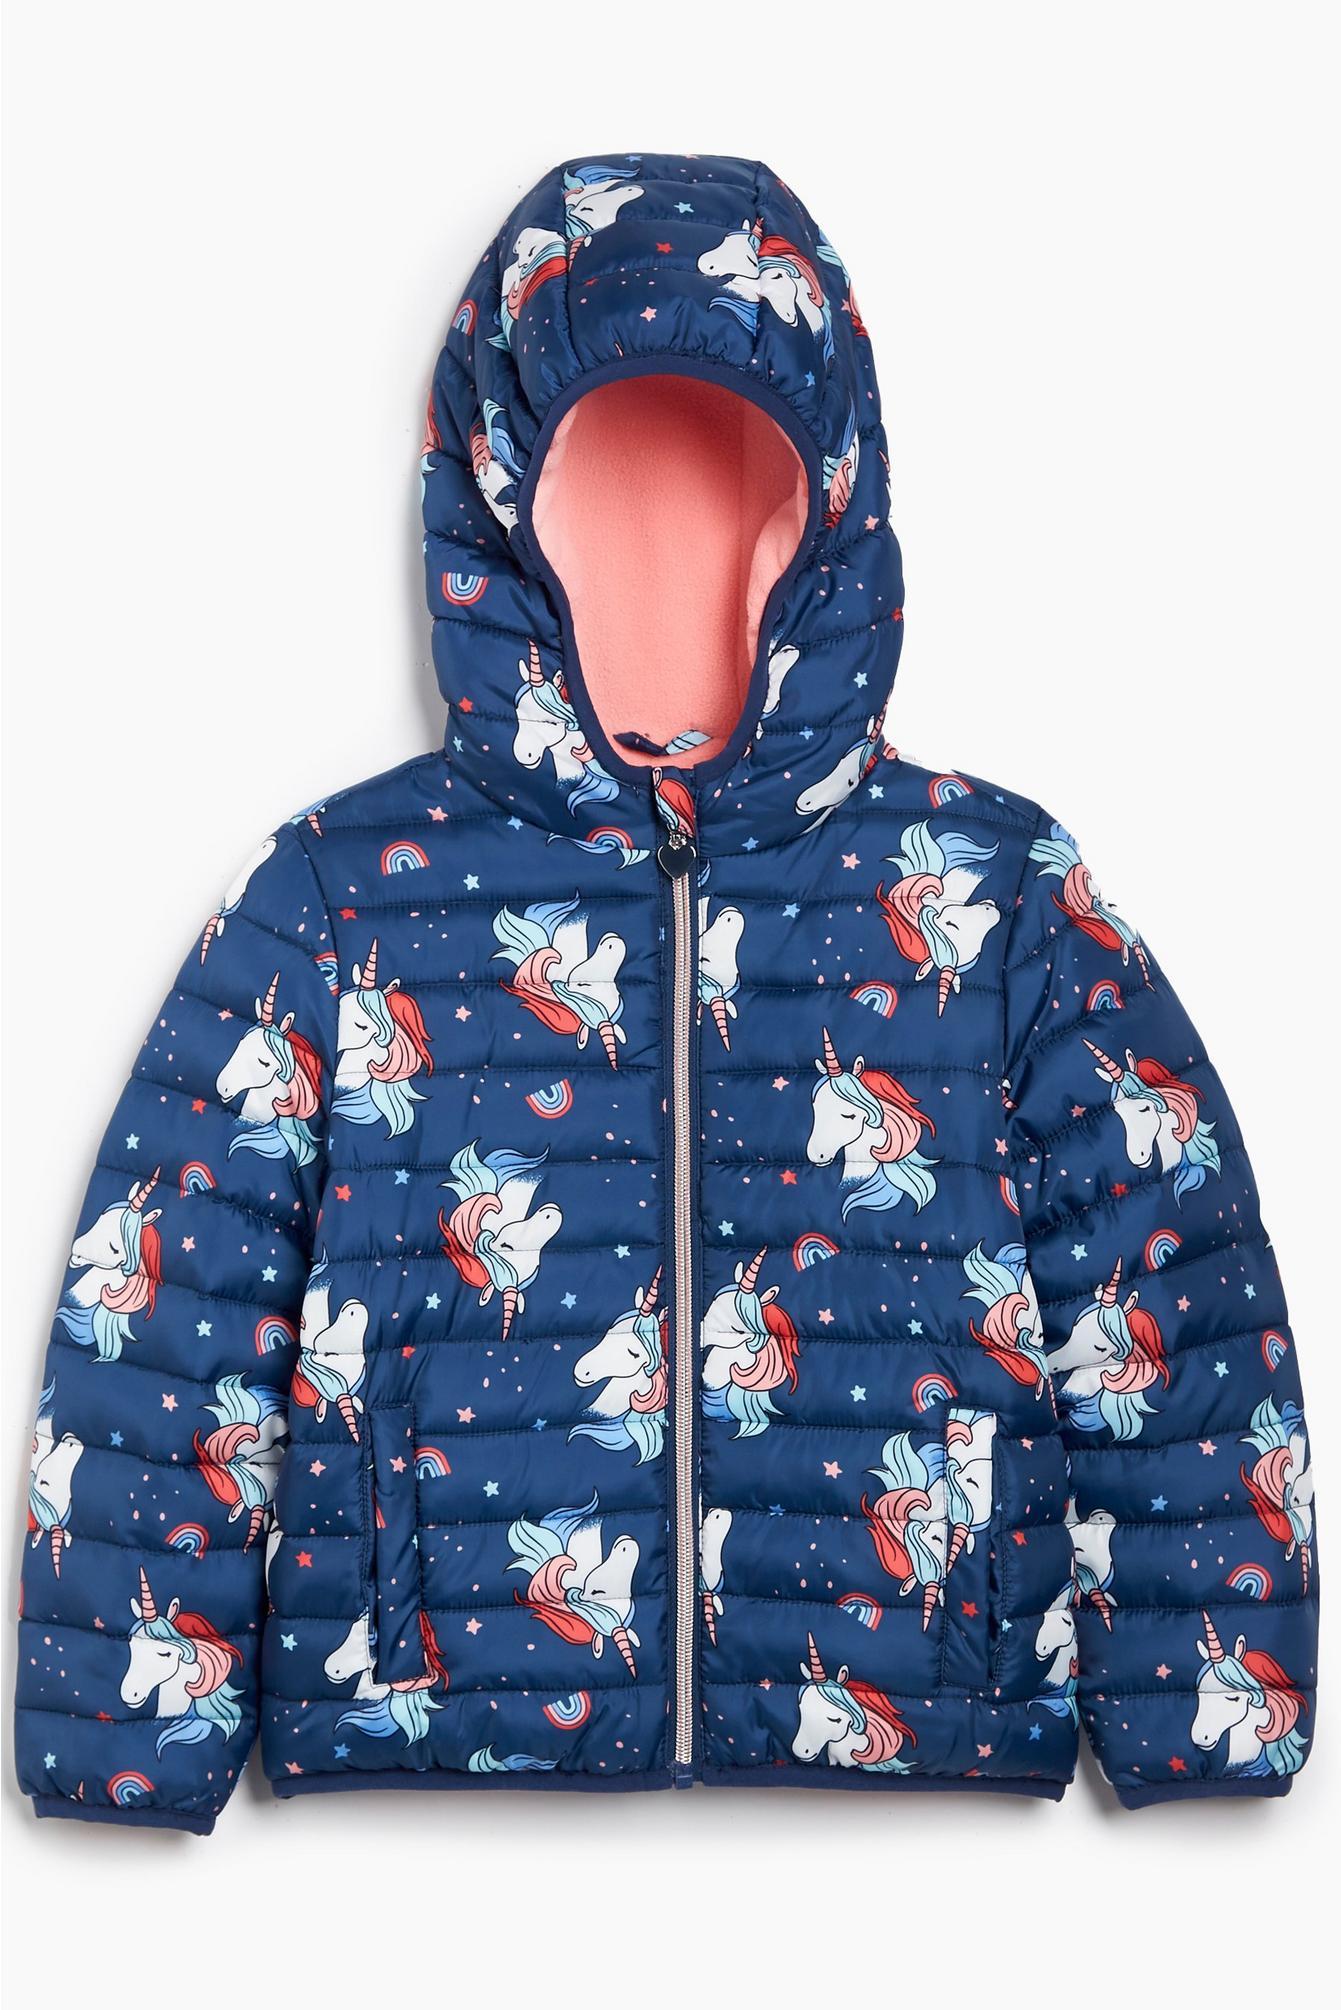 Navy blue coat with unicorn pattern